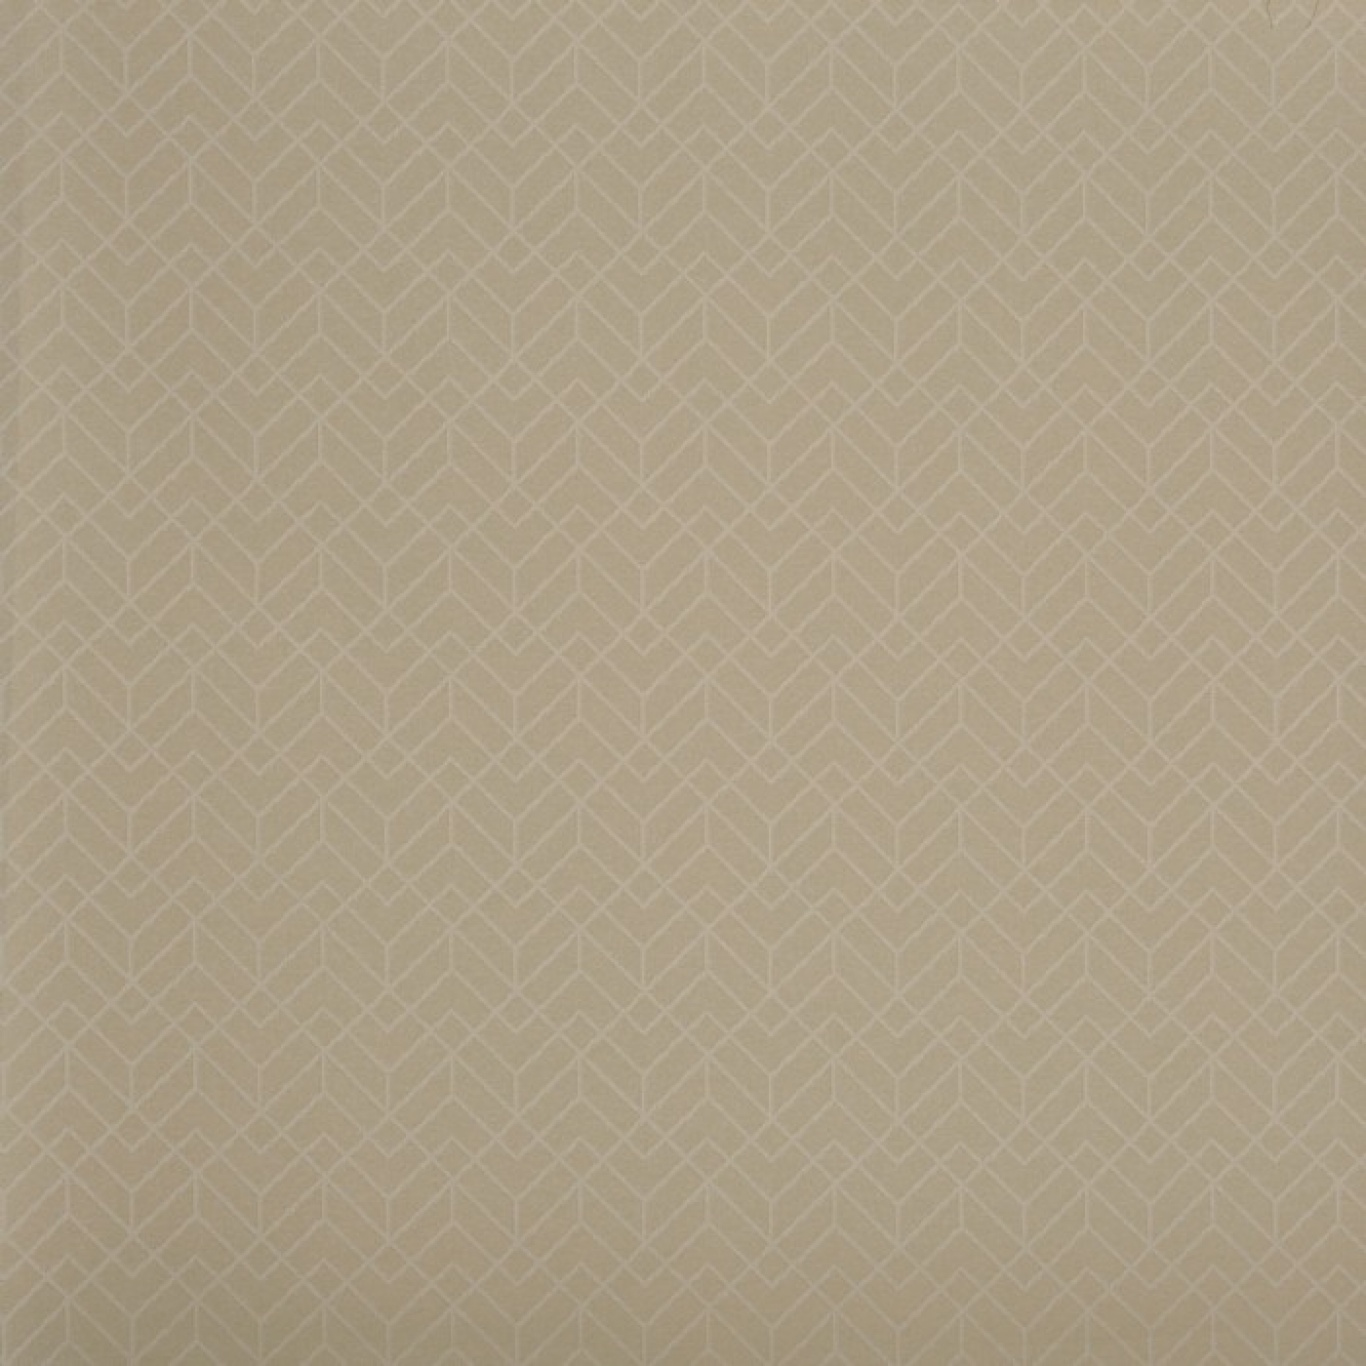 Image of Prestigious Penrose Hessian FR Fabric 2019/158